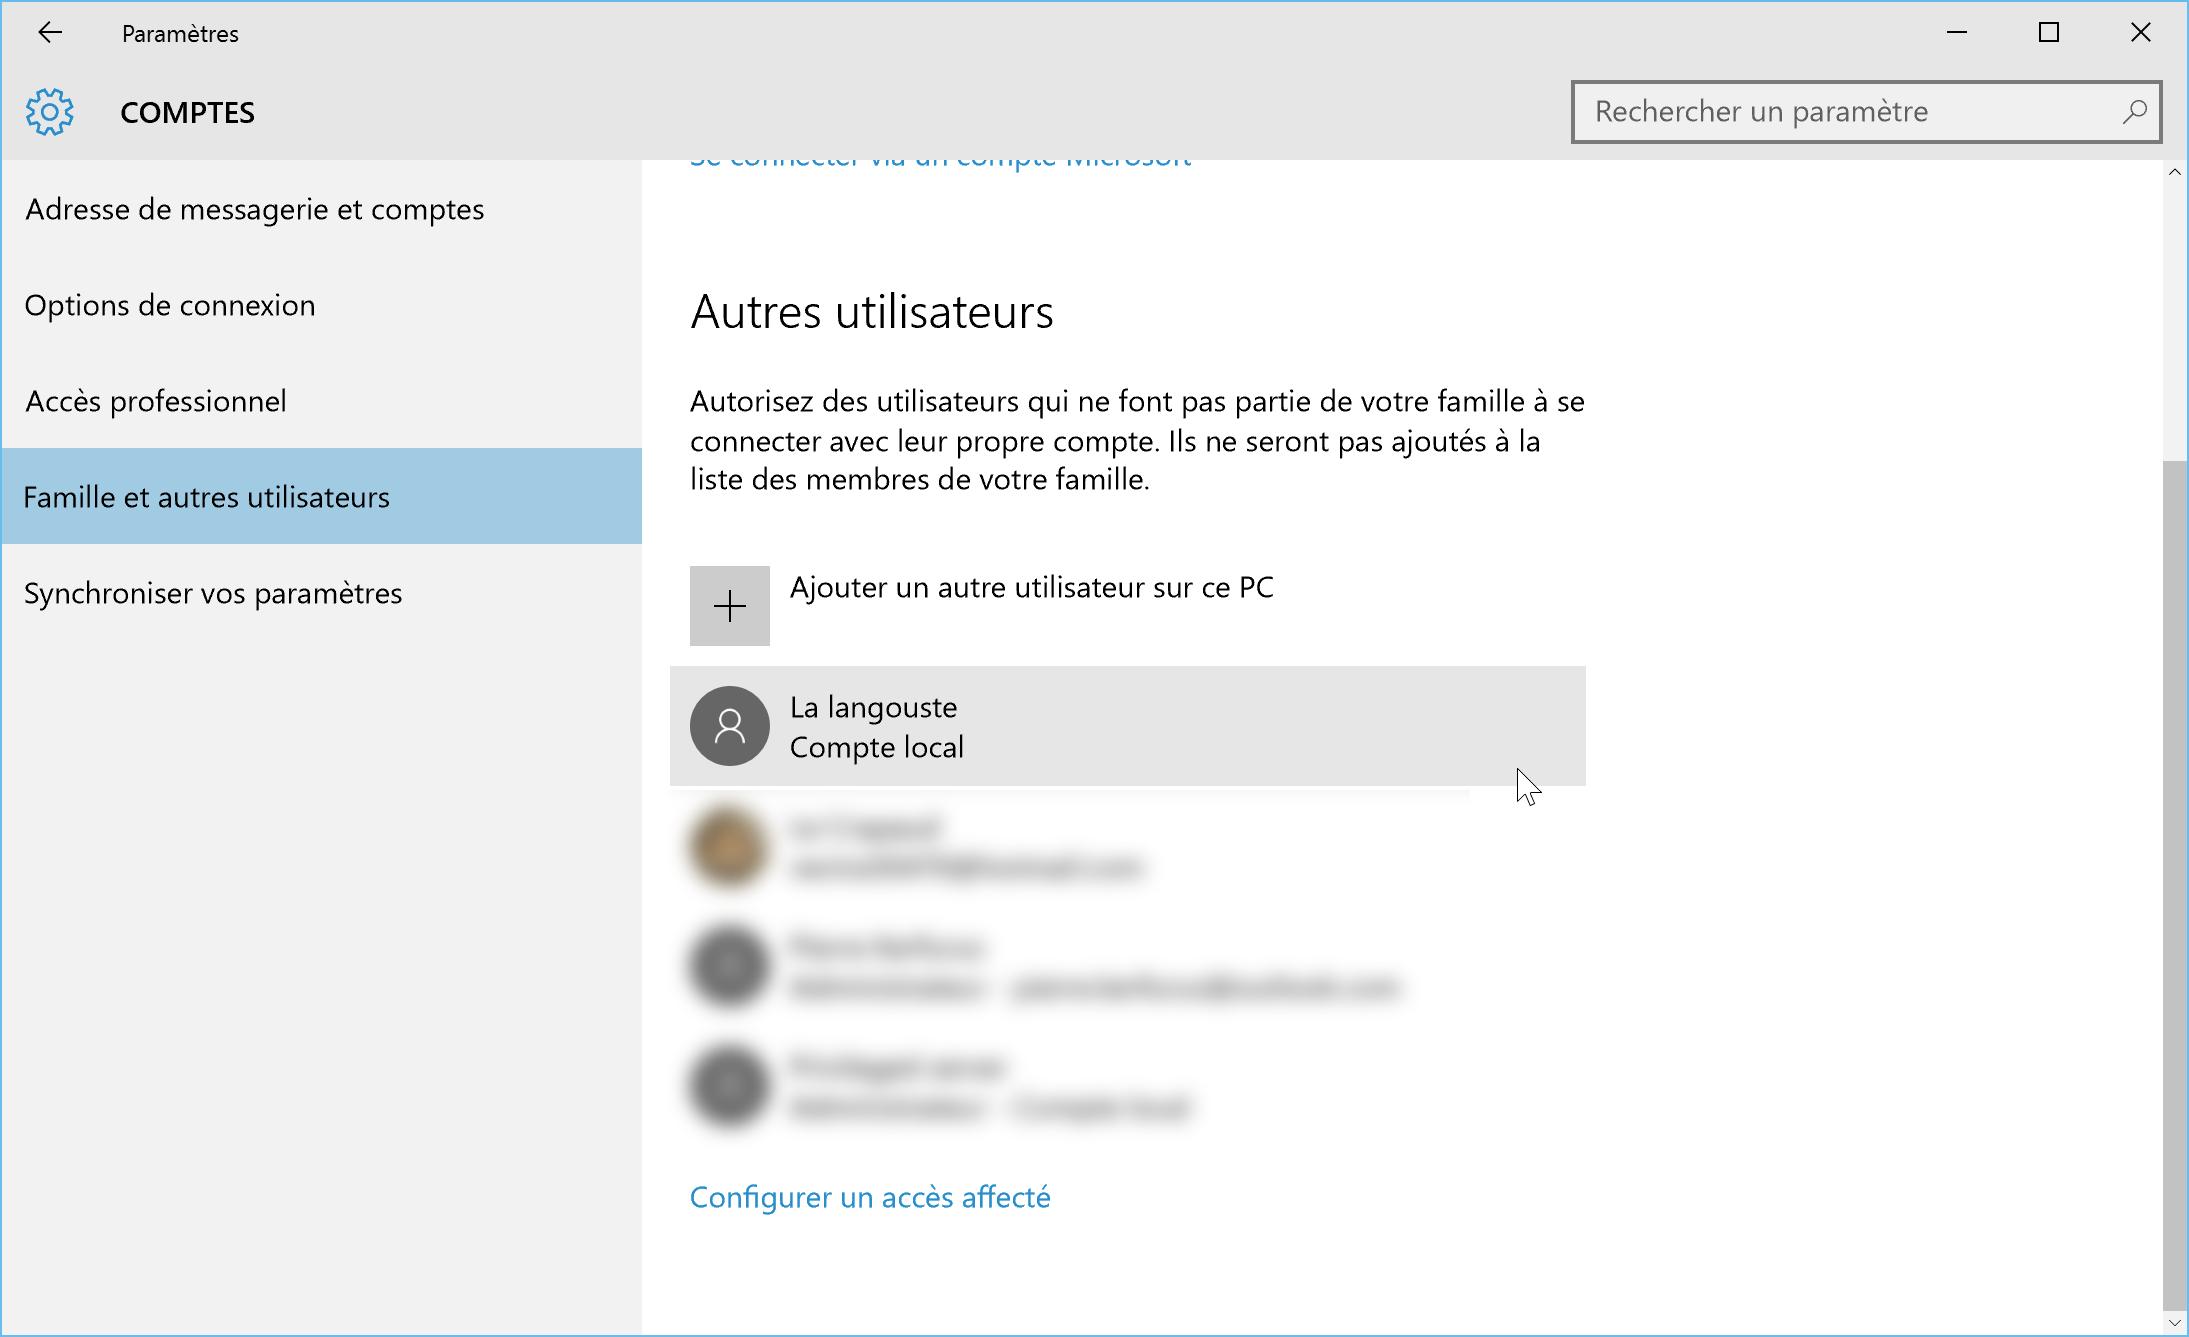 creer-un-compte-utilisateur-local-sur-windows-10-liste-utilisateurs